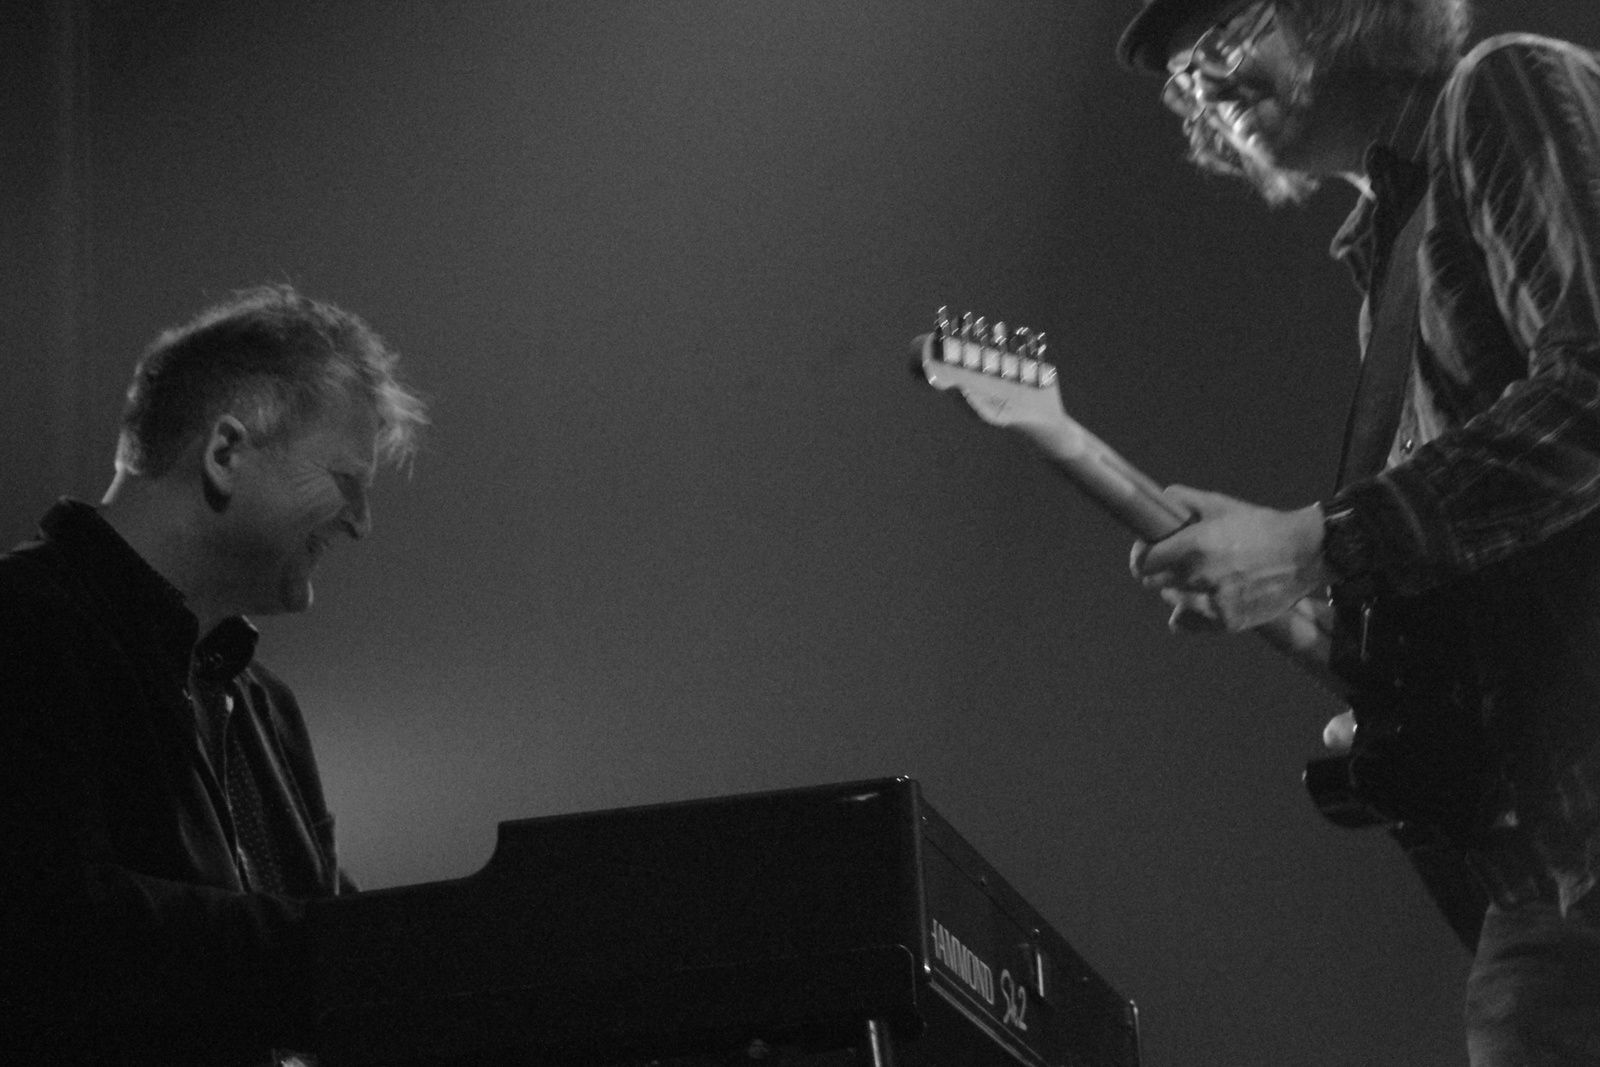 Phil Bee's Freedom - 25/11/2017 - Athena Blues Festival, St Saulve (59)